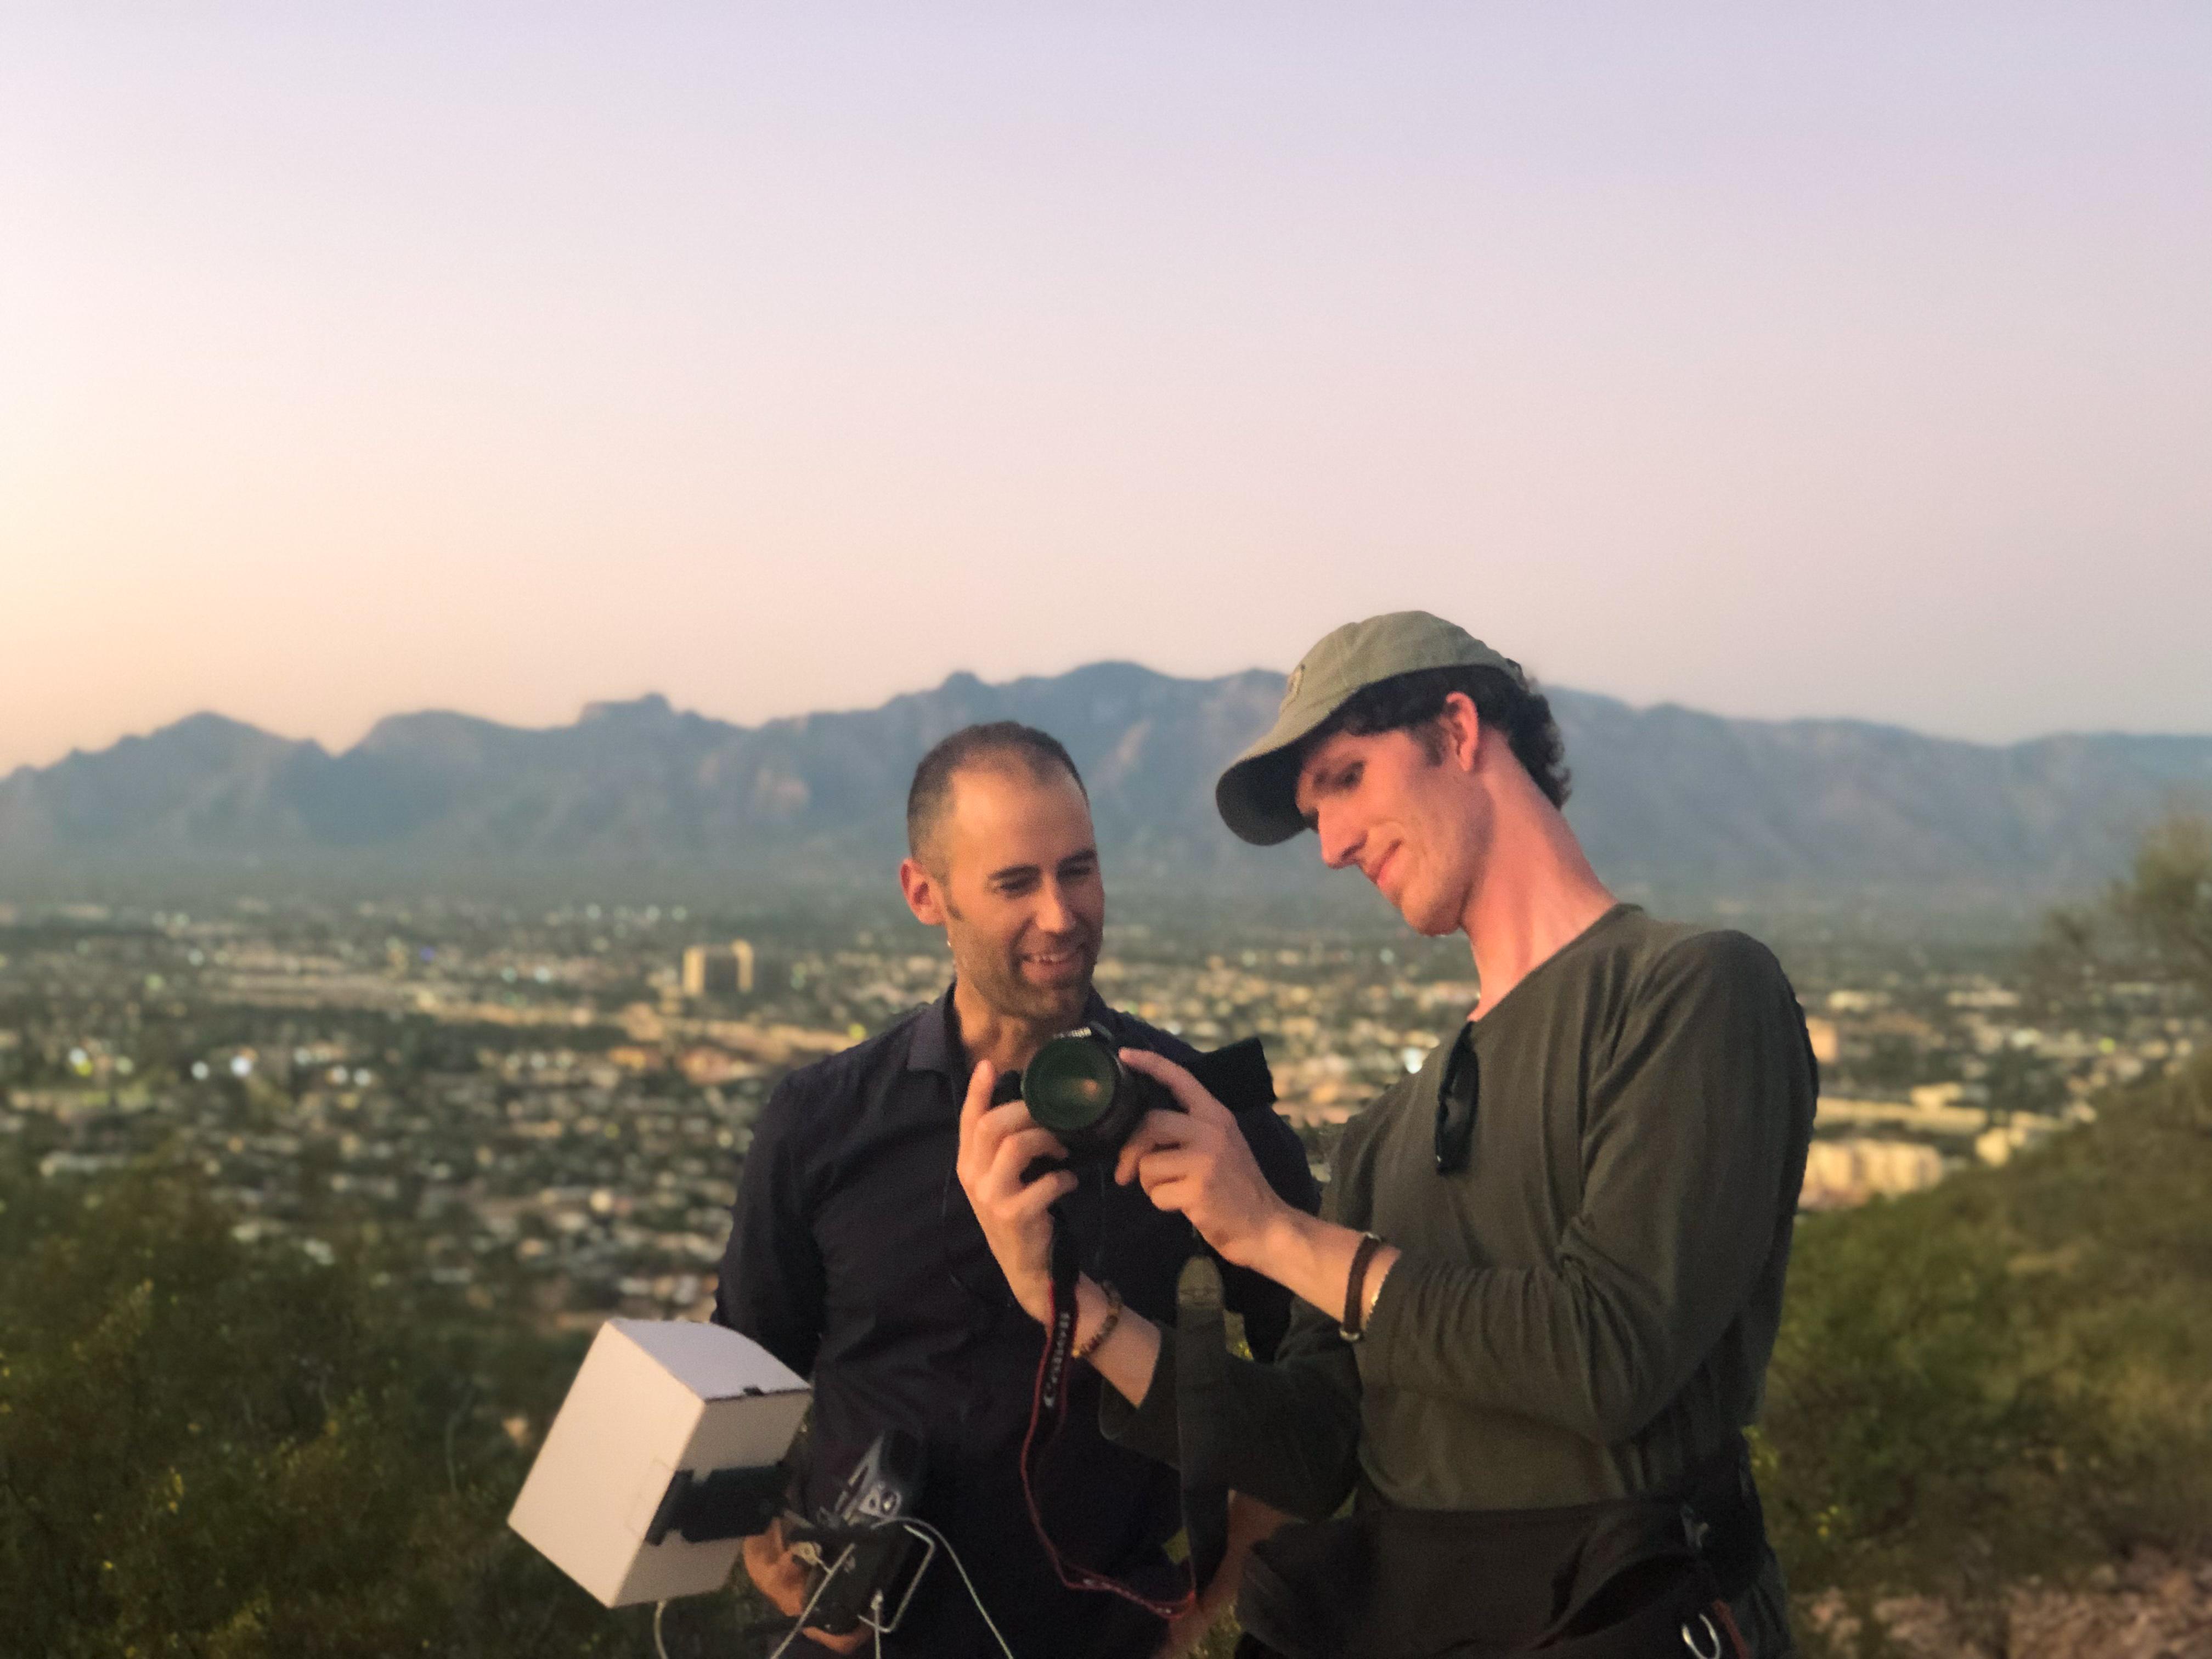 Landmark Stories producers analyze shots